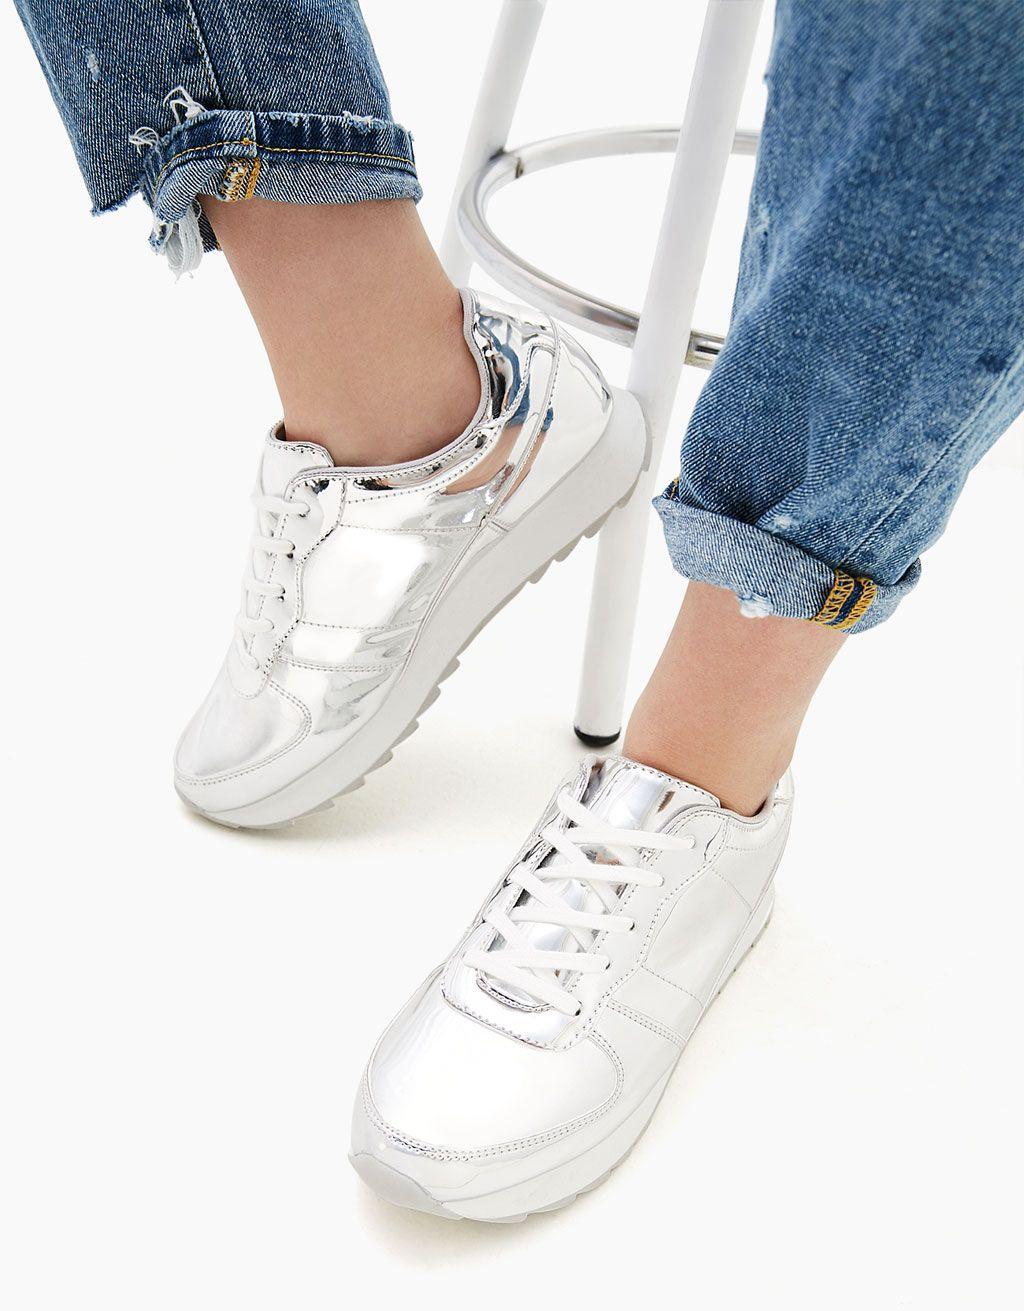 Sznurowane Metalizowane Buty Sportowe Buty Bershka Poland Shoes Tretorn Sneaker Vivi Fashion